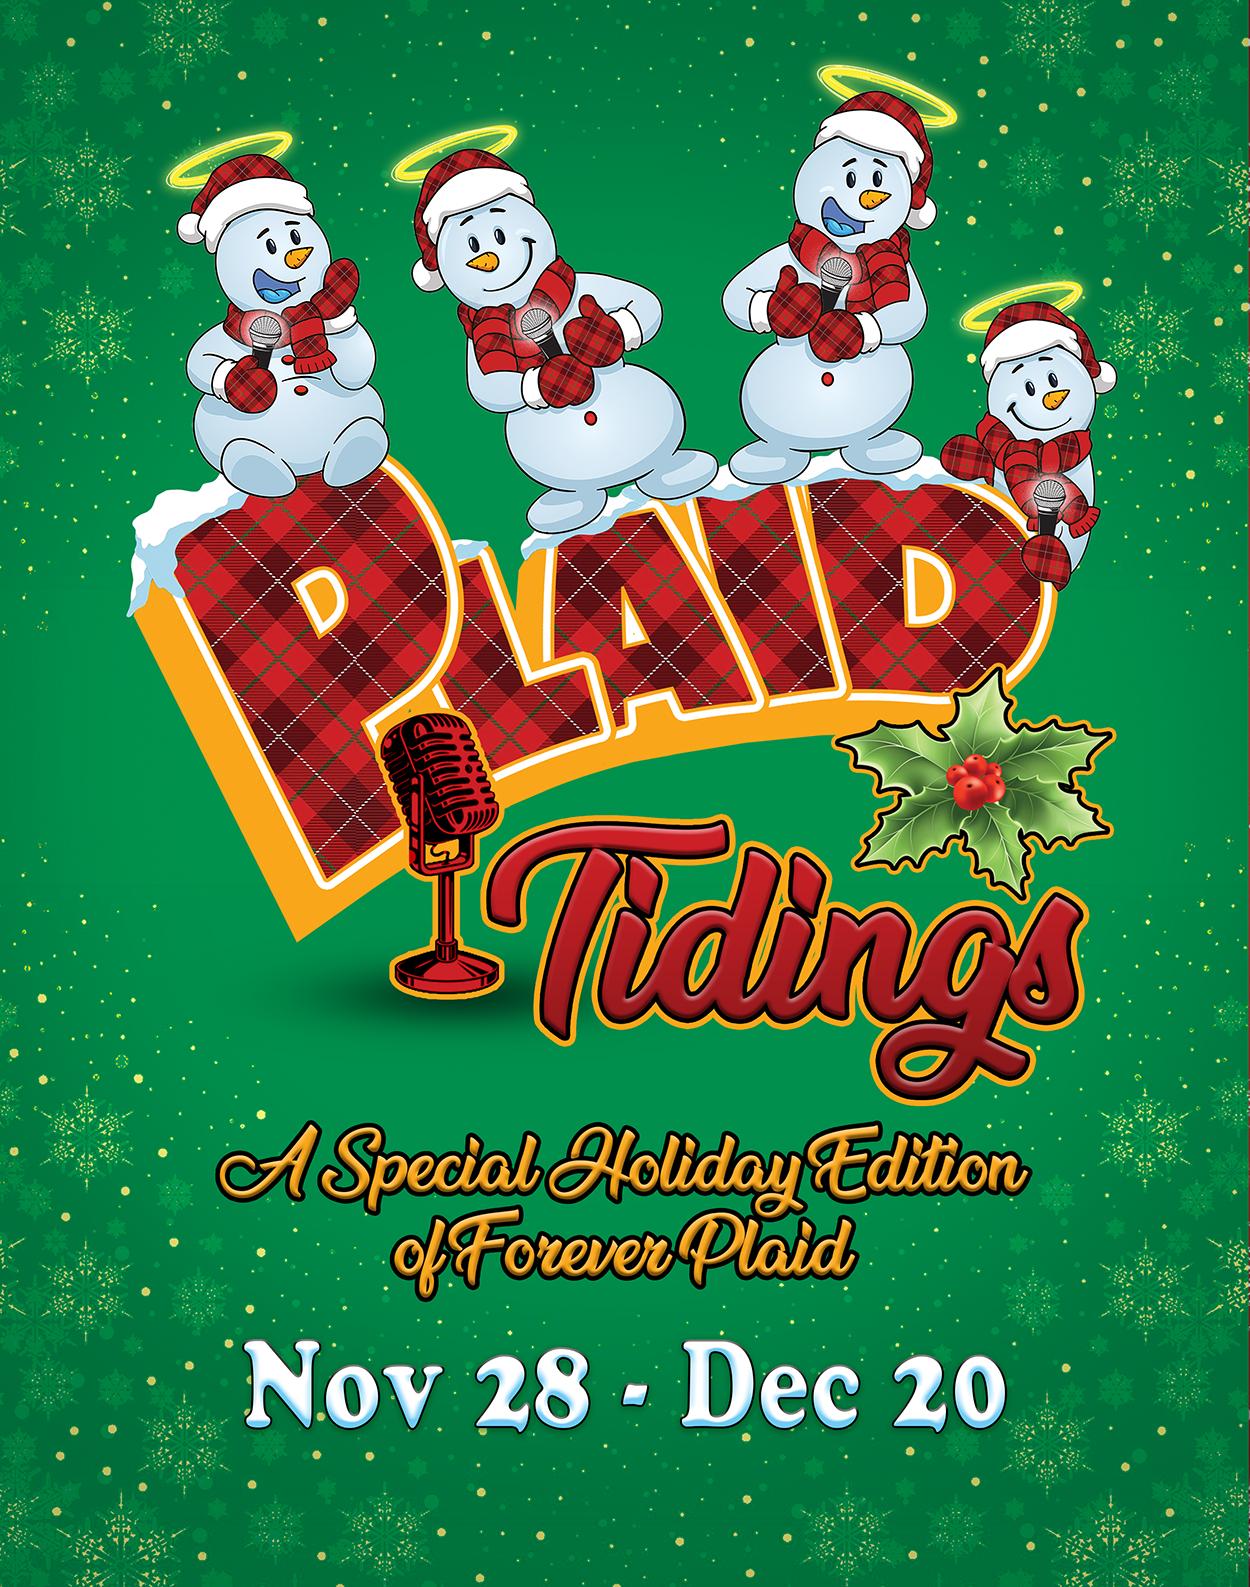 Christmas Specila On December 6 2020 Plaid Tidings | Athens Theatre | Deland, Florida